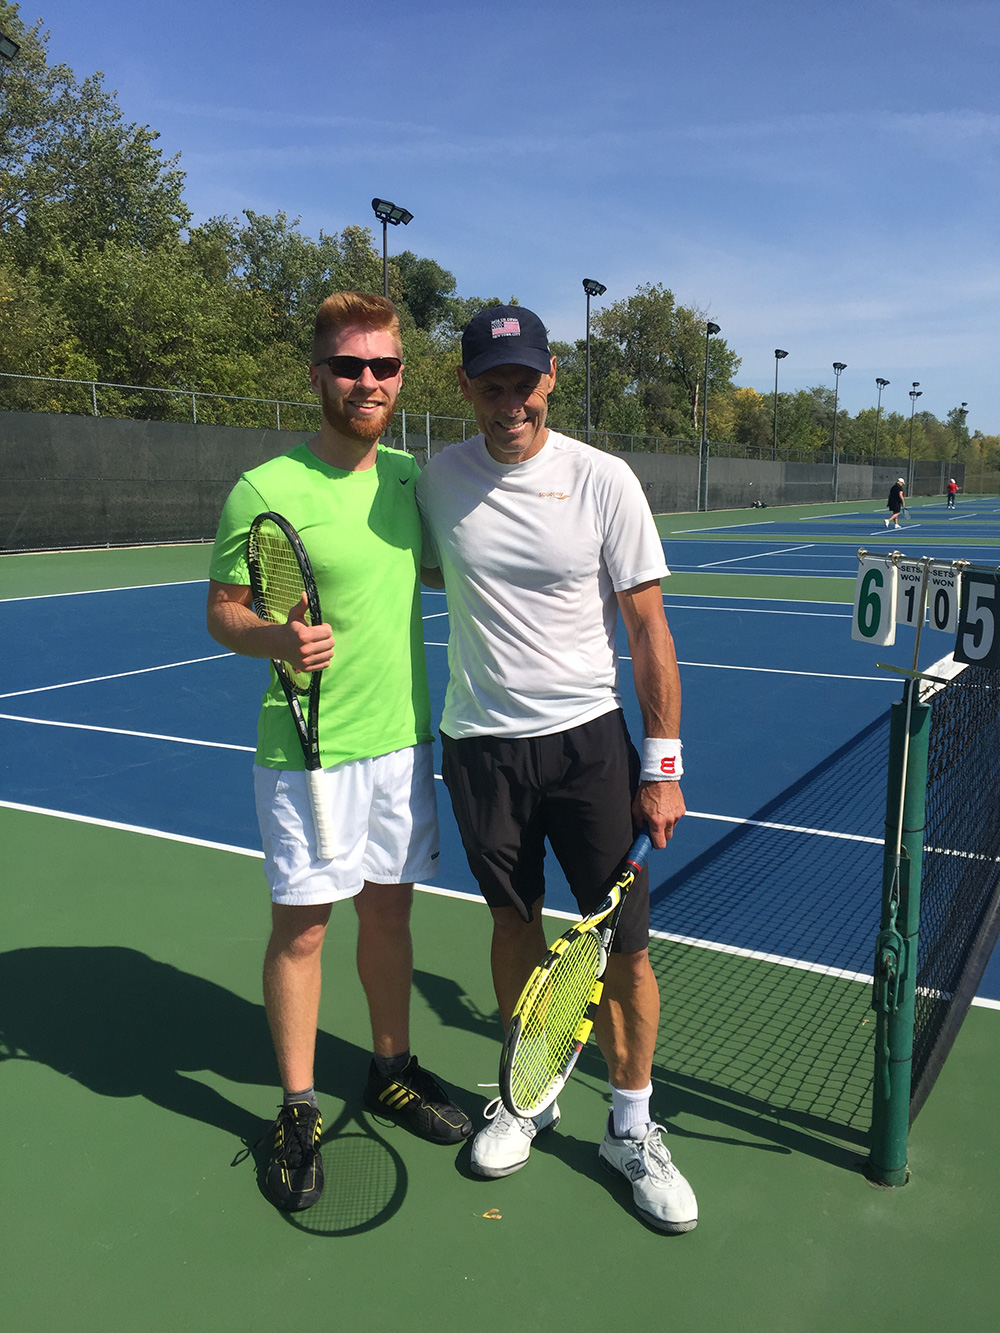 Trevor Skidmore and Darrell Bushuk - Men's Singles Finalists'